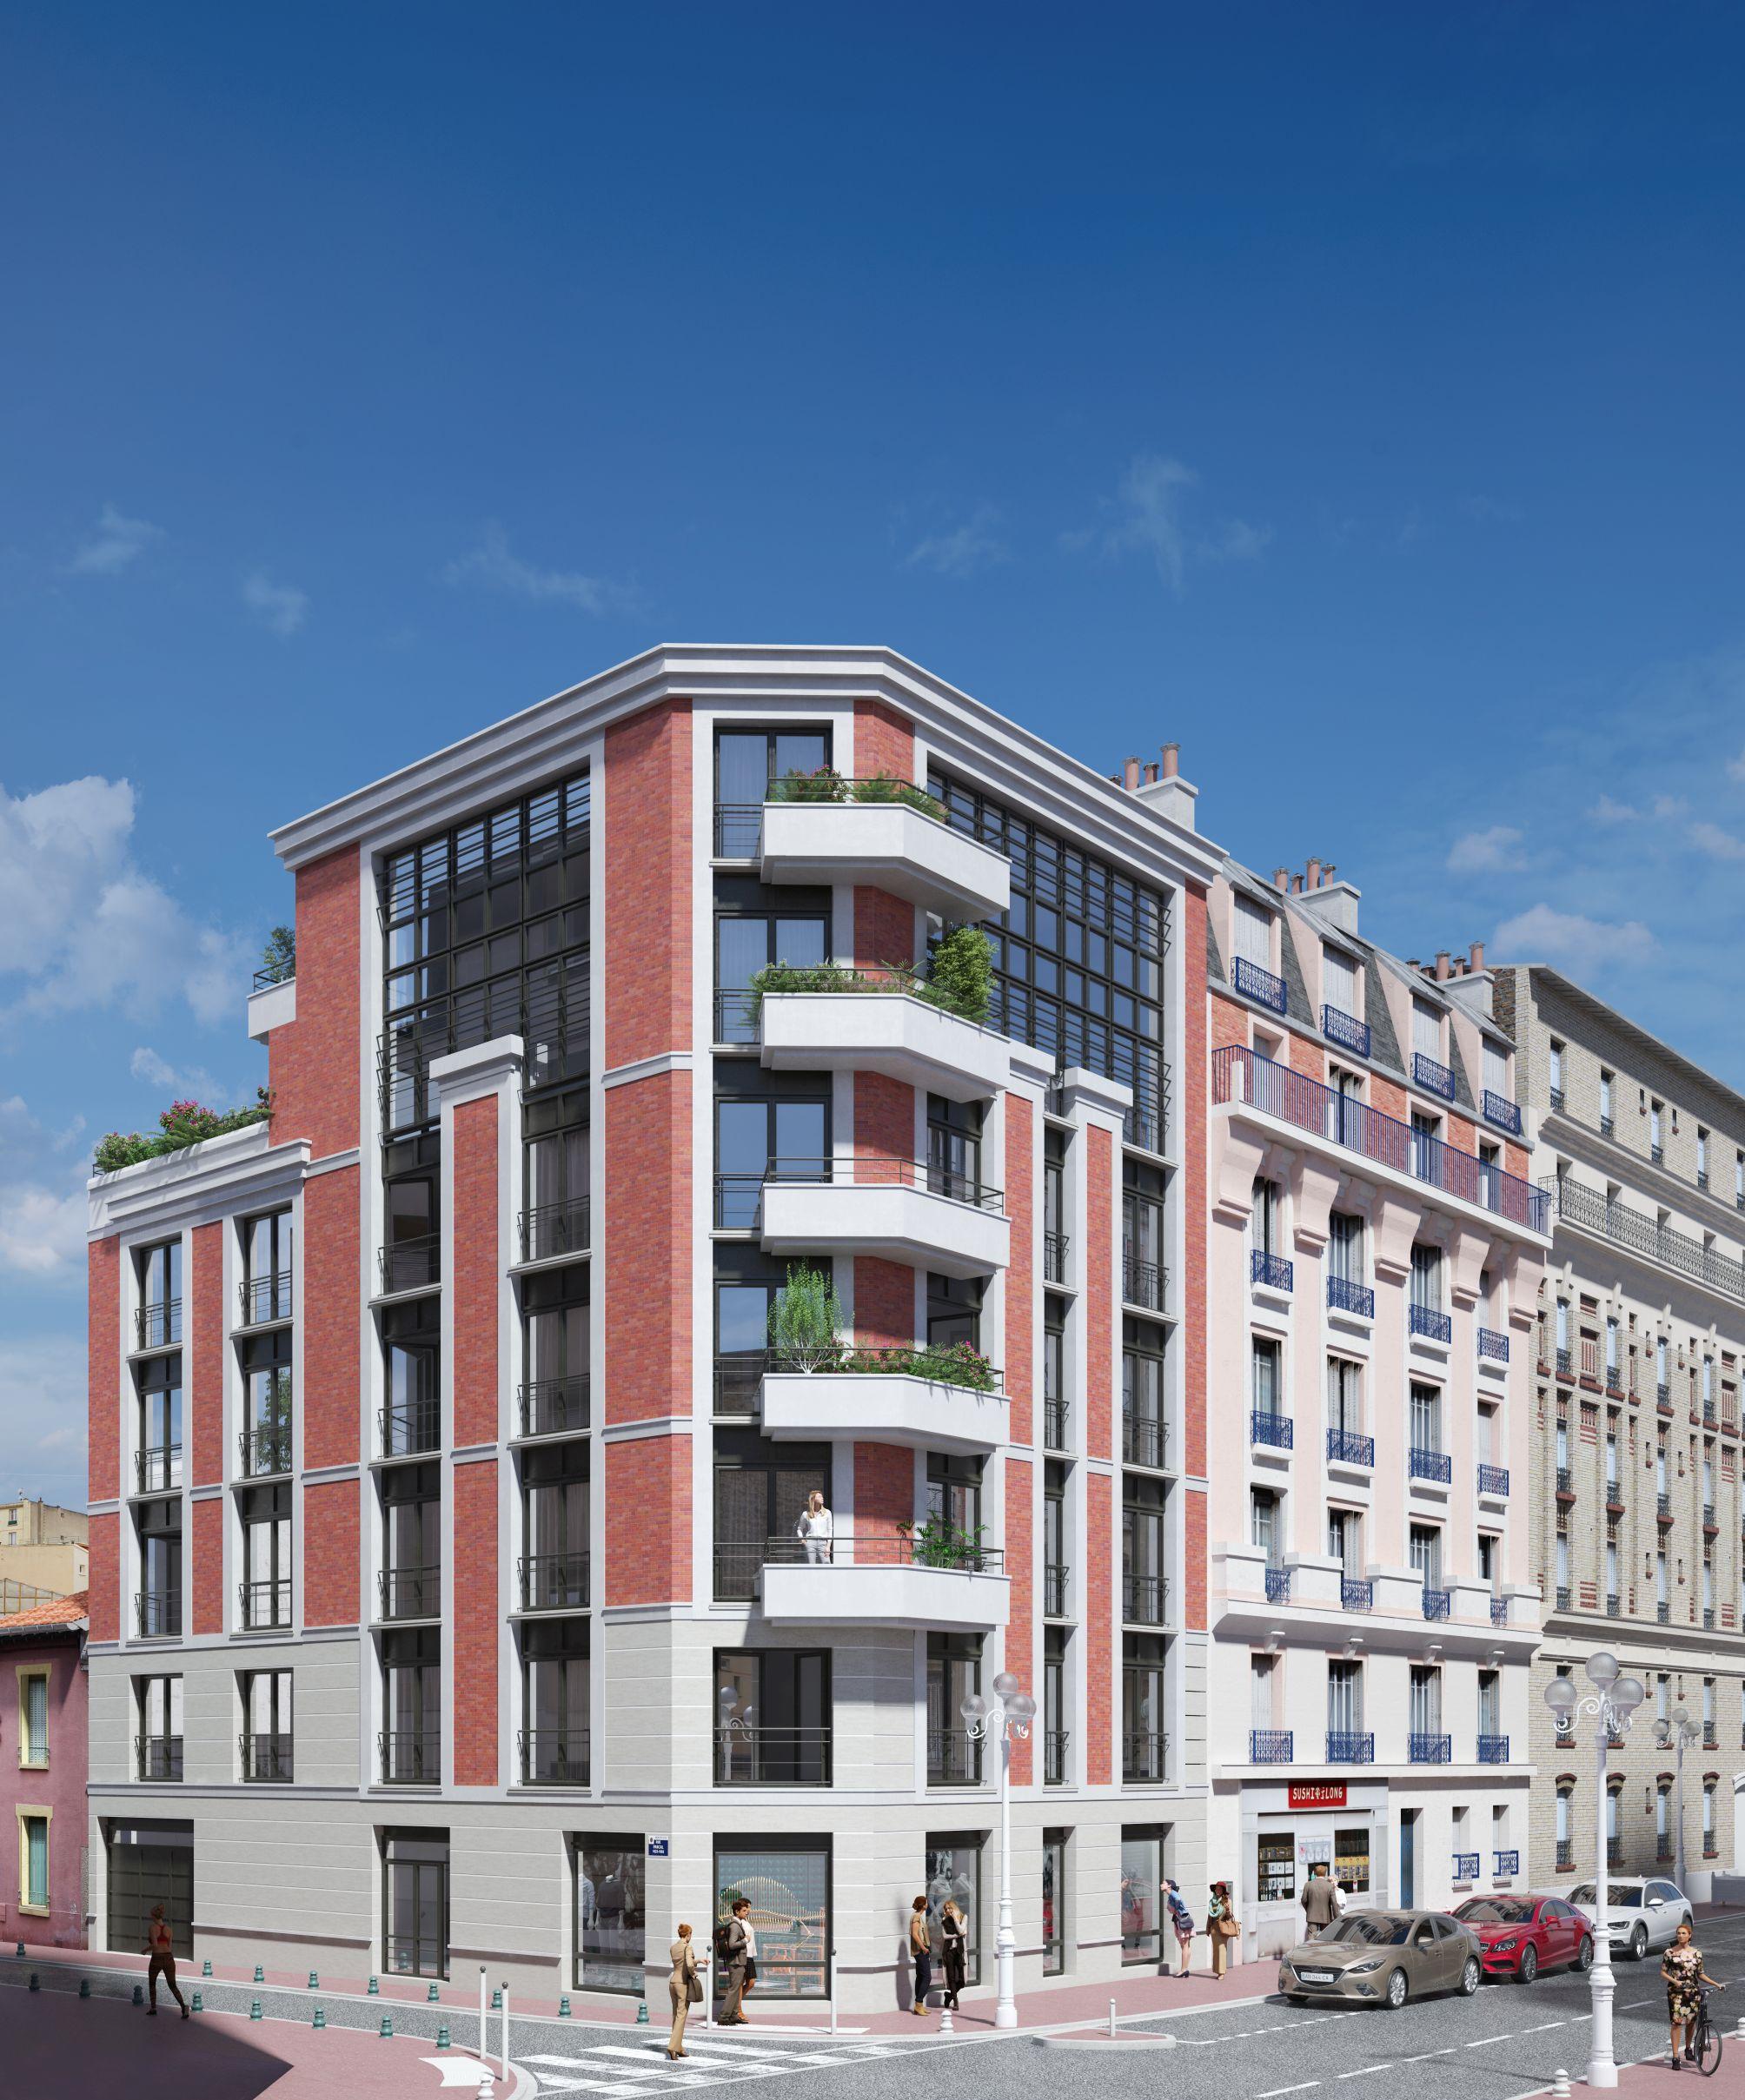 Piso, Montrouge - Ref 301-51328